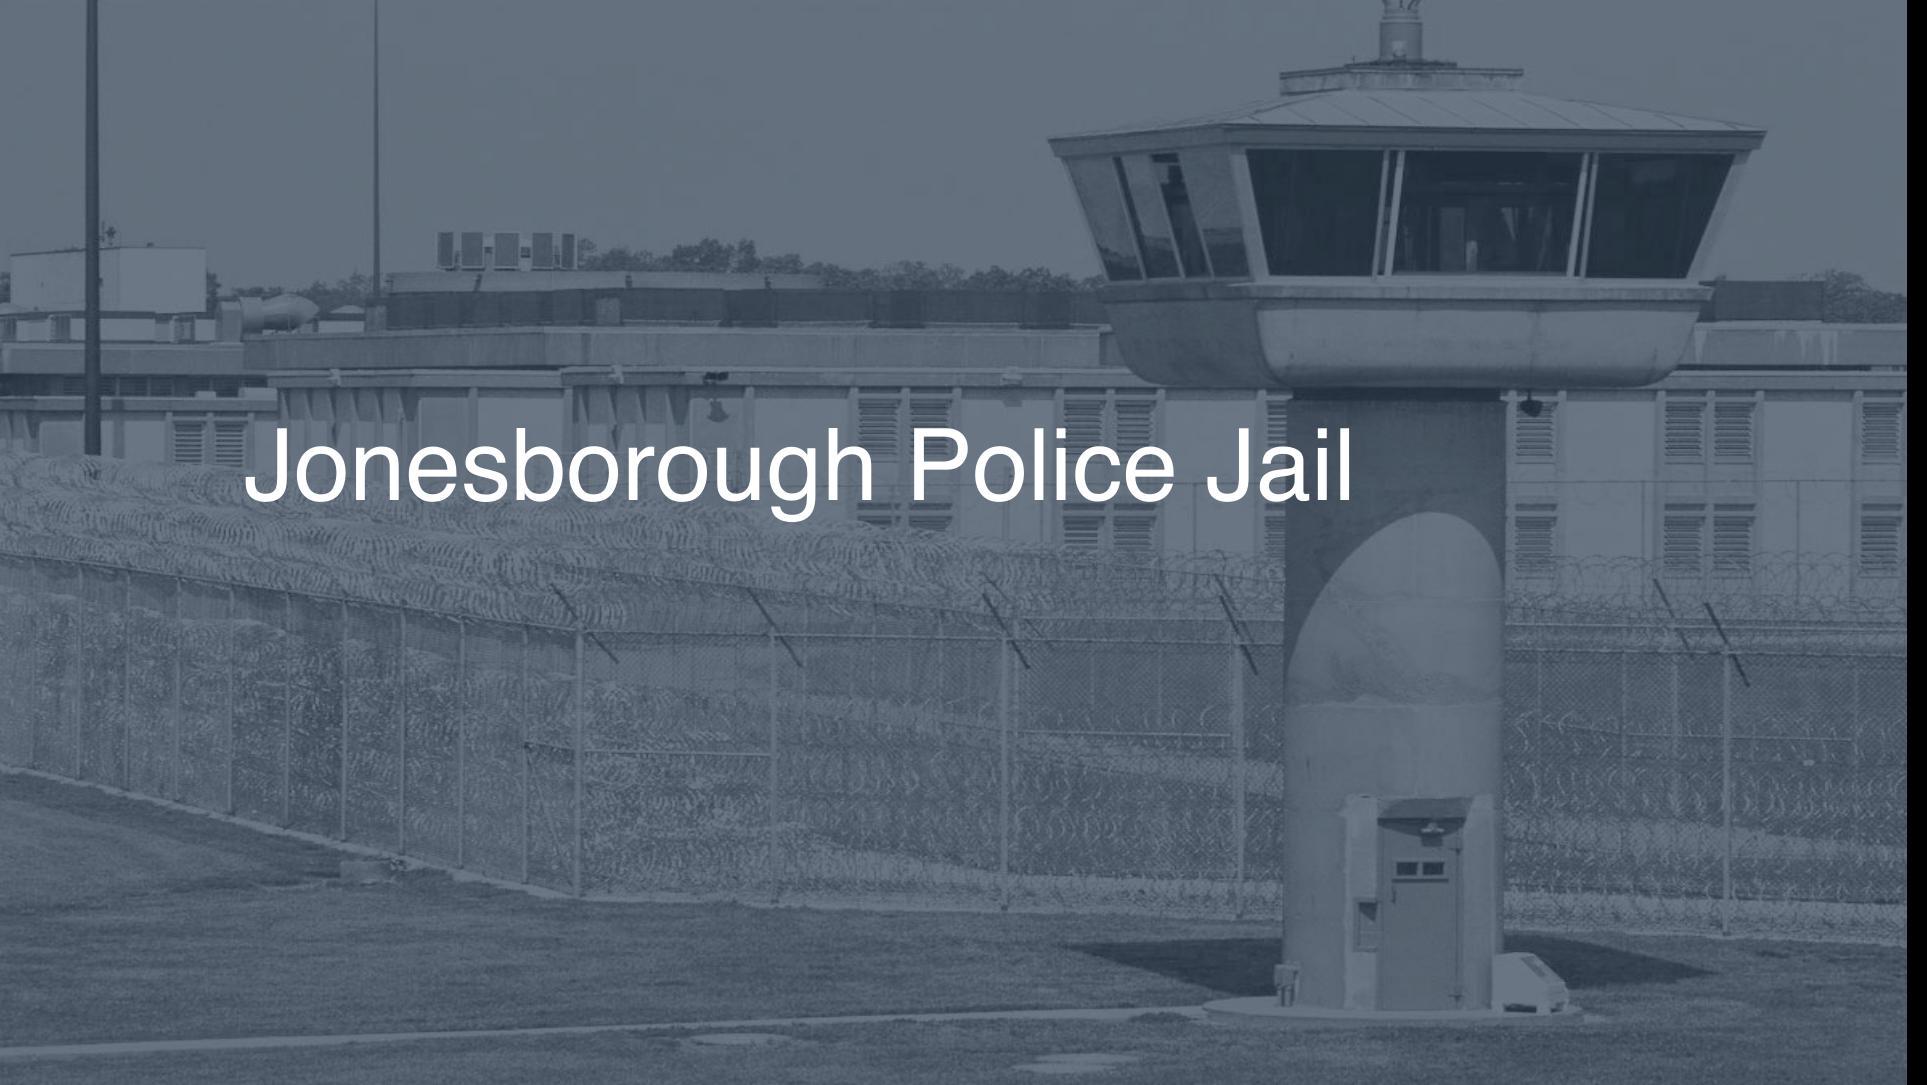 Jonesborough Police Jail correctional facility picture